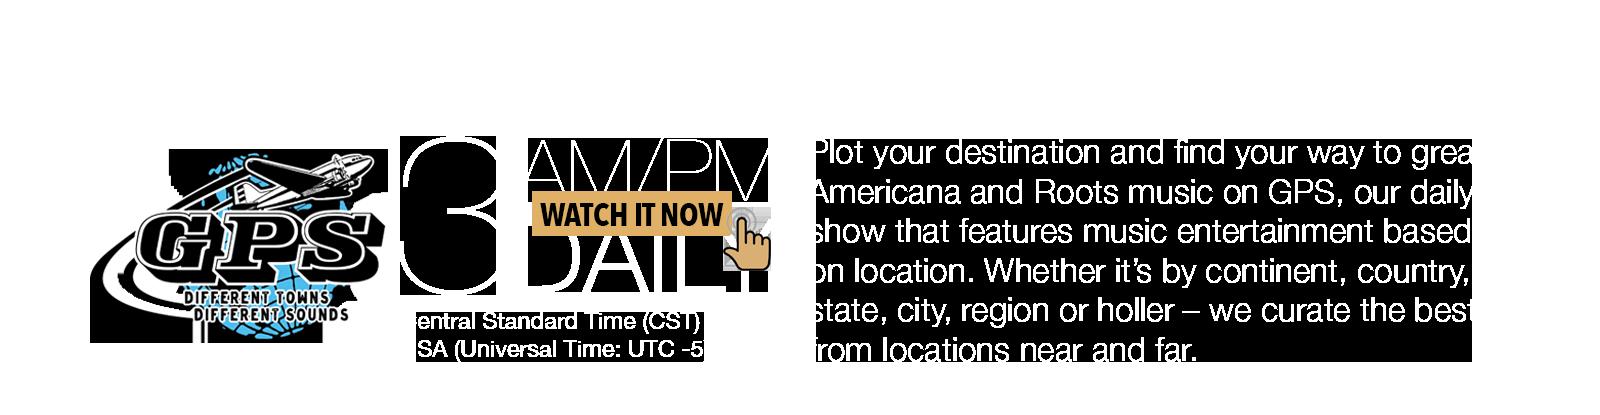 HomePageSlide-GPS3-Click